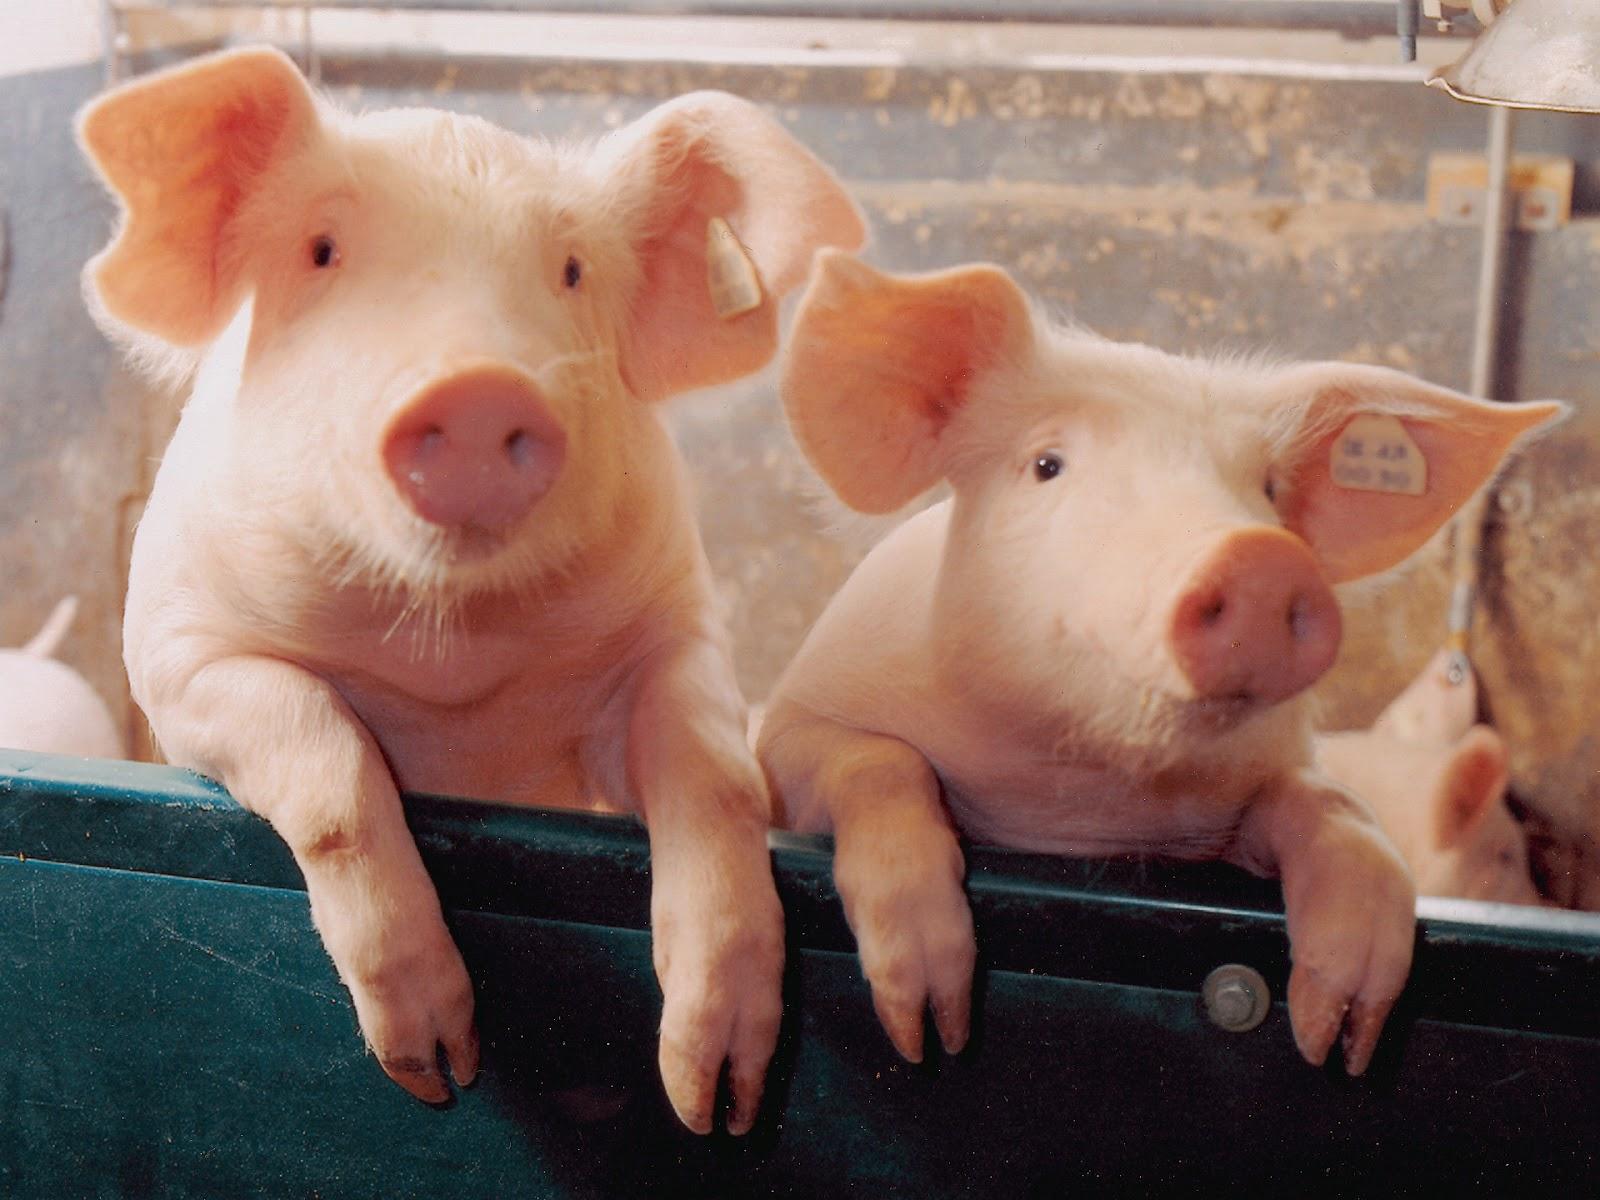 pig wallpaper,domestic pig,suidae,snout,nose,livestock